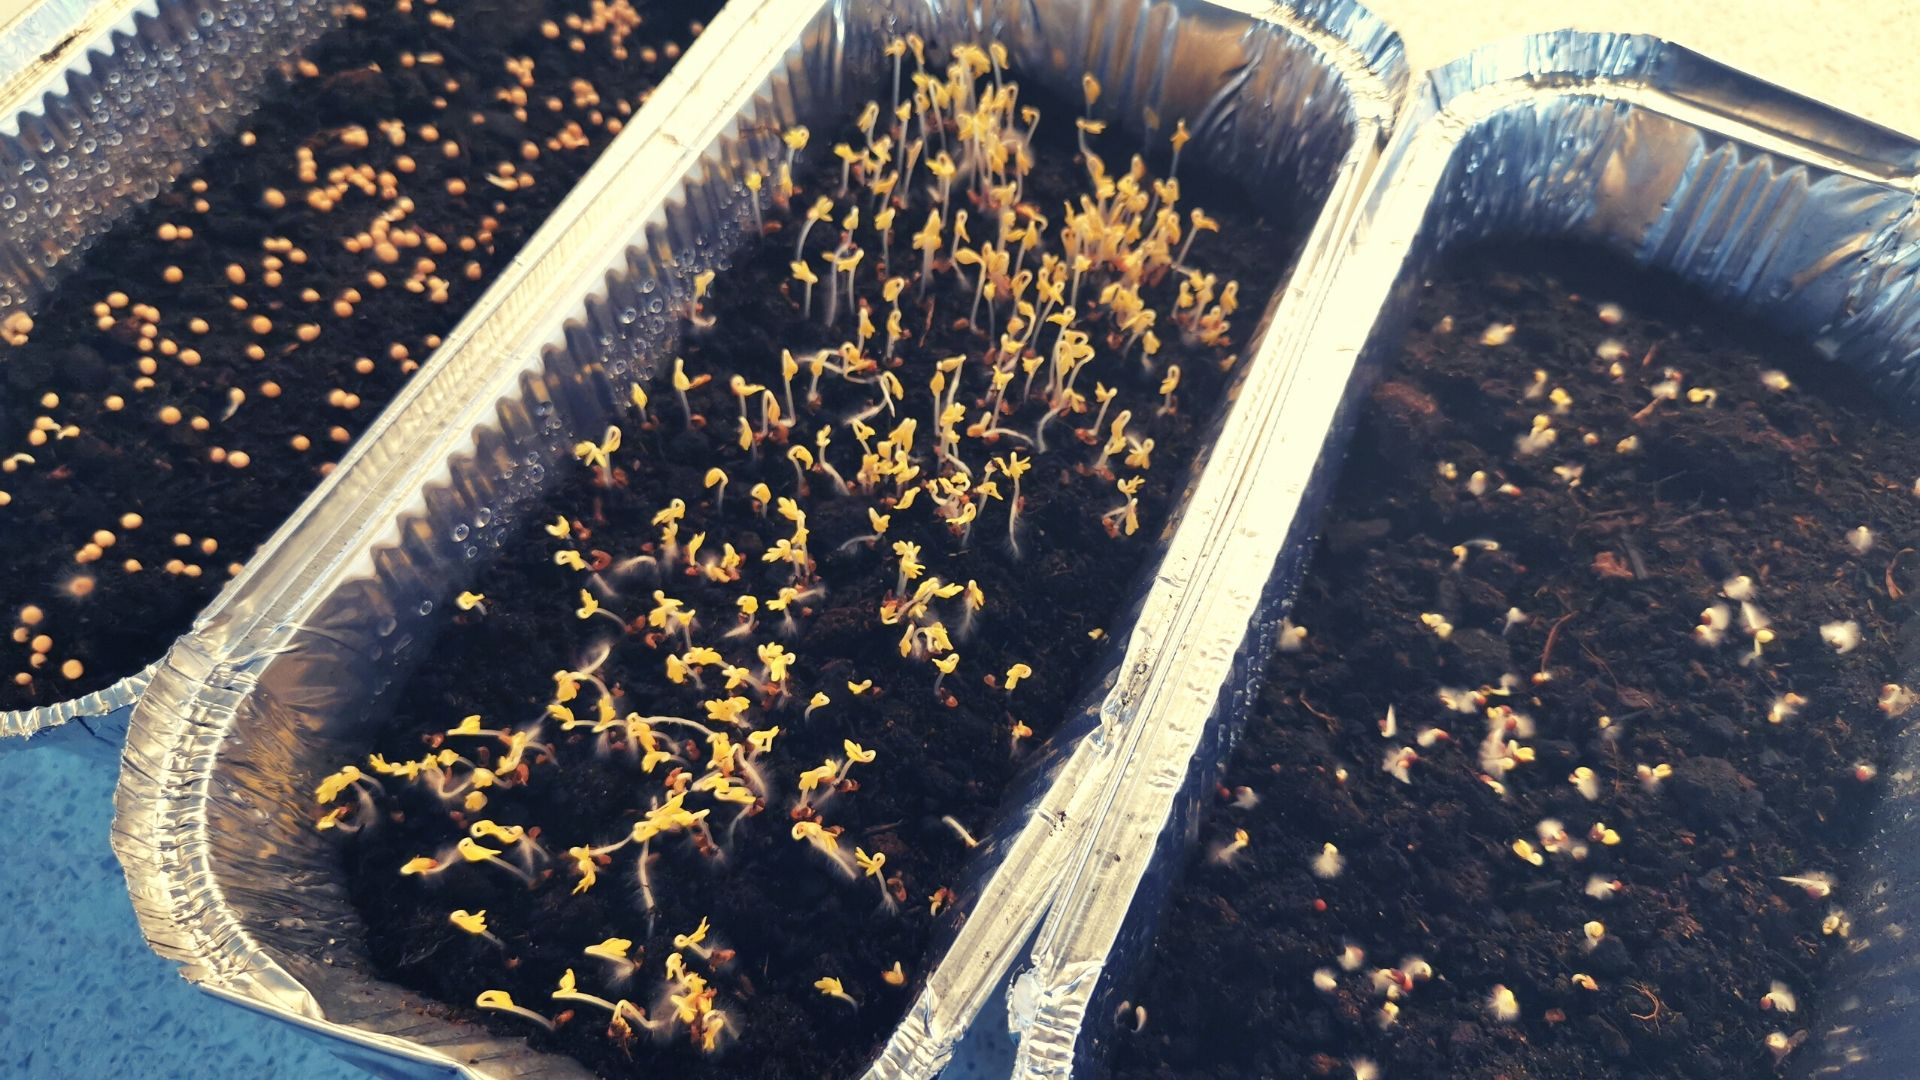 Microgreen-Growth-Day-3